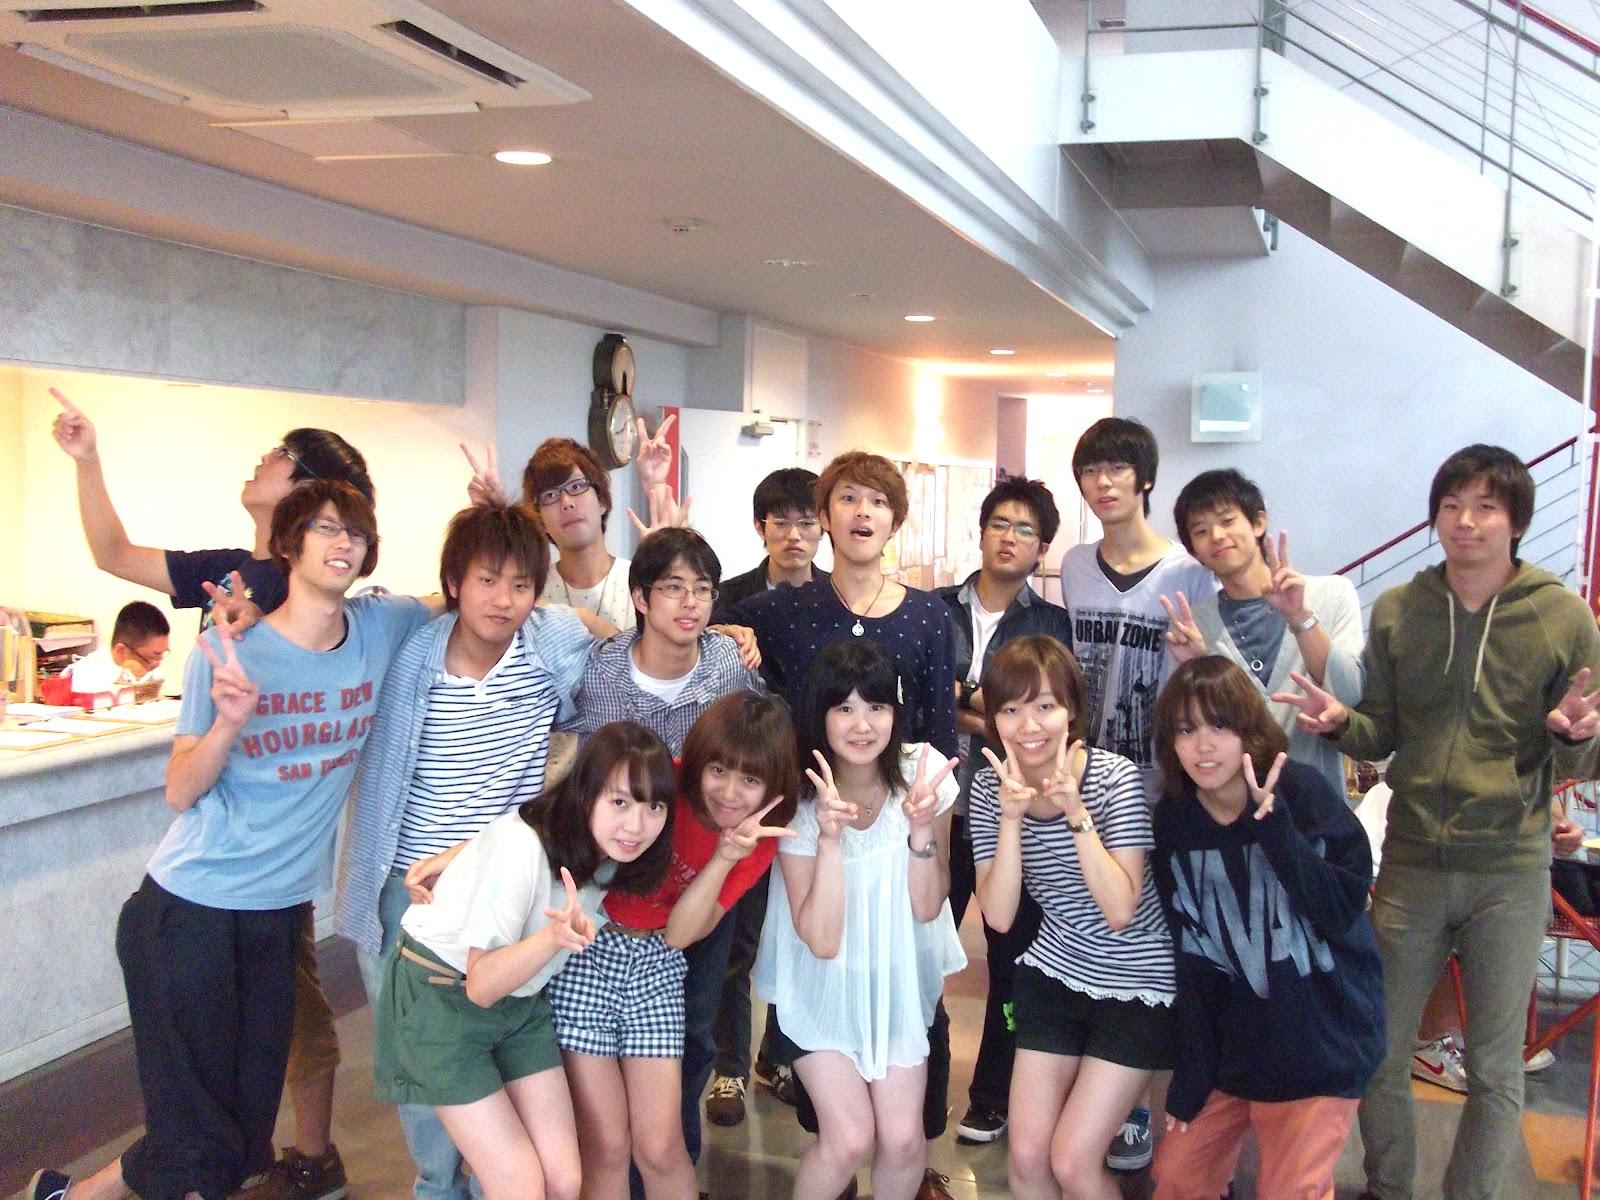 石巻中部自動車学校公式ブログ: 夏の合宿免許2012